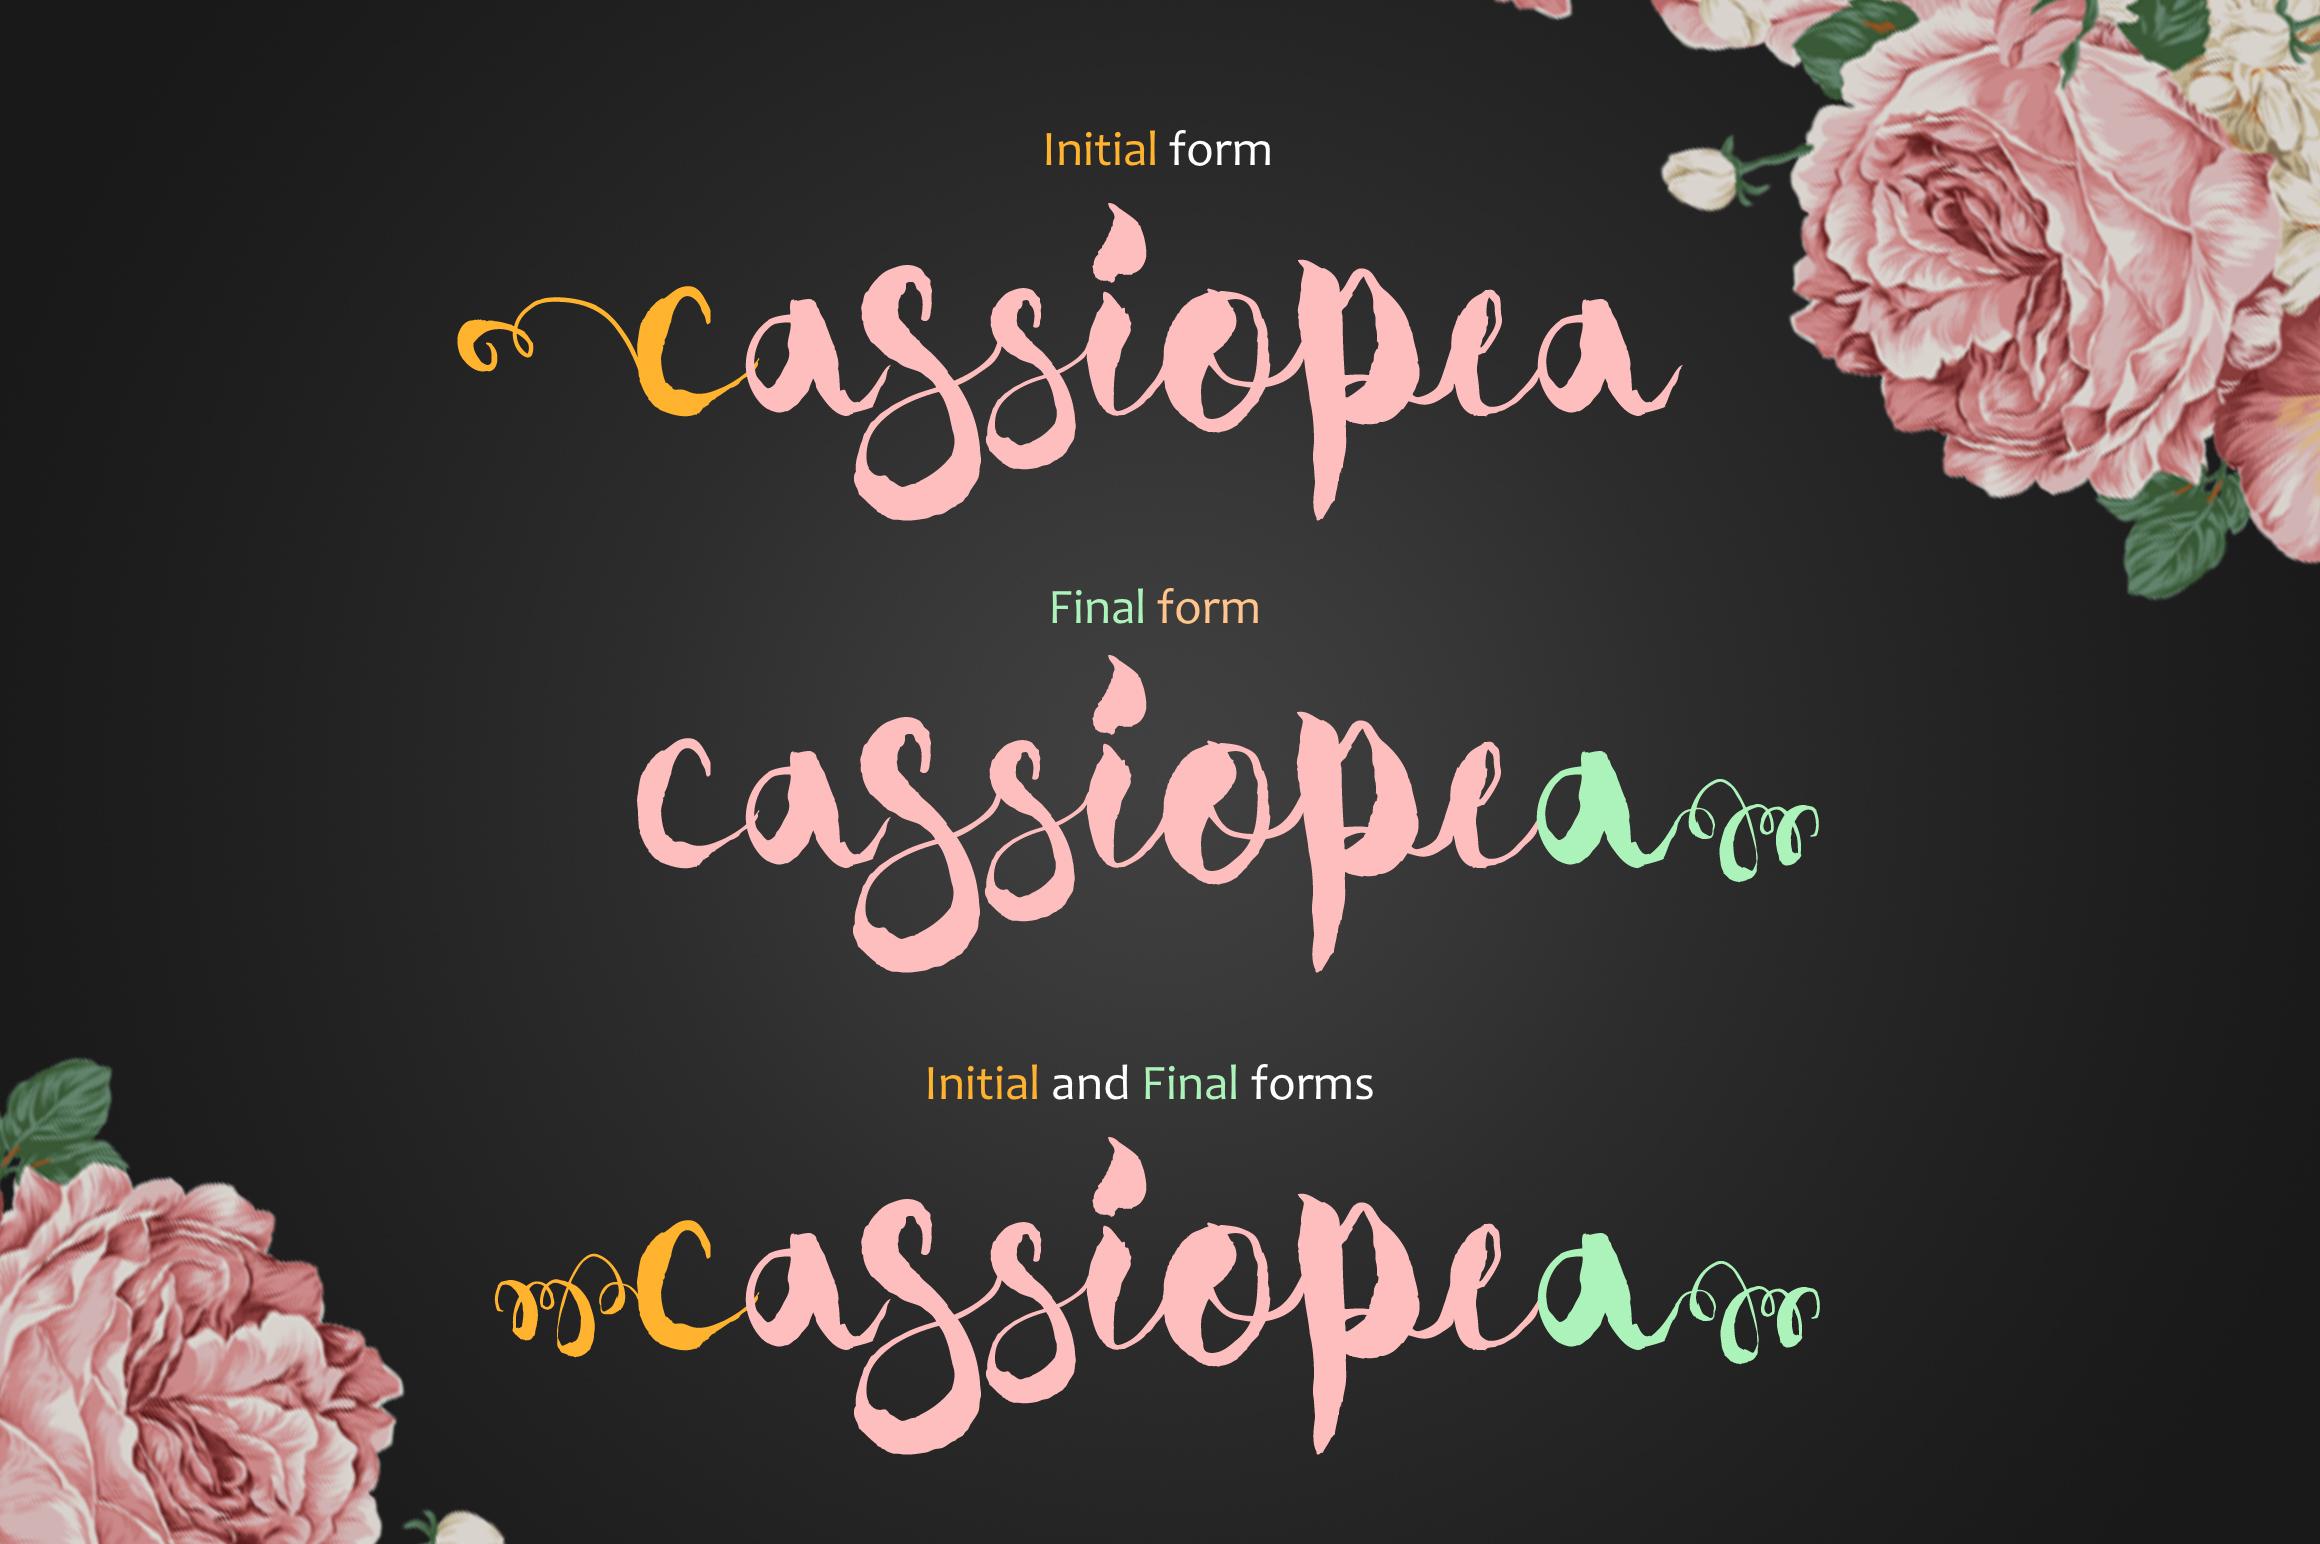 Cassiopea example image 4